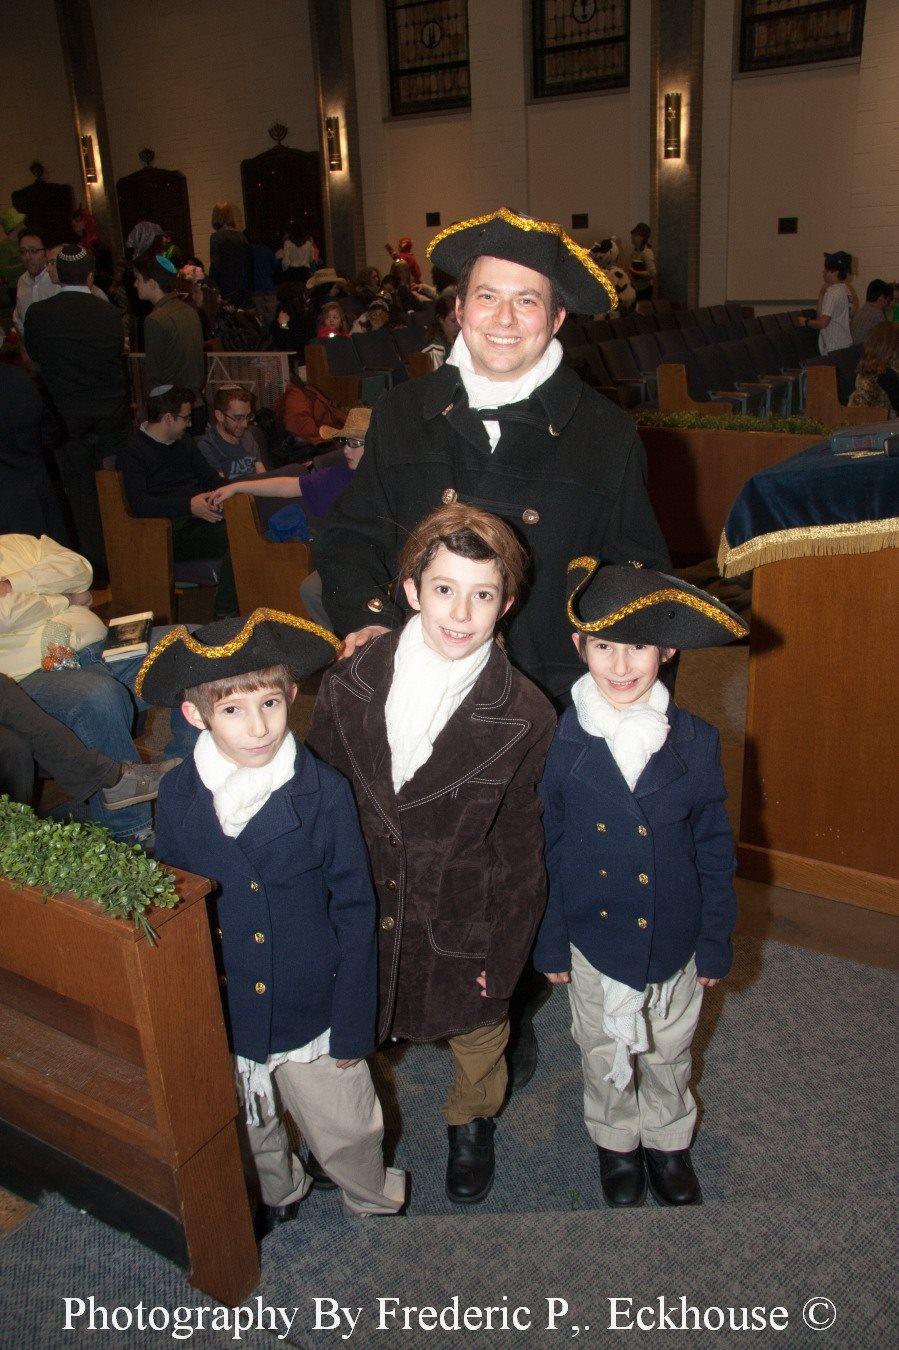 Sara's family dressed as the cast of  Hamilton.